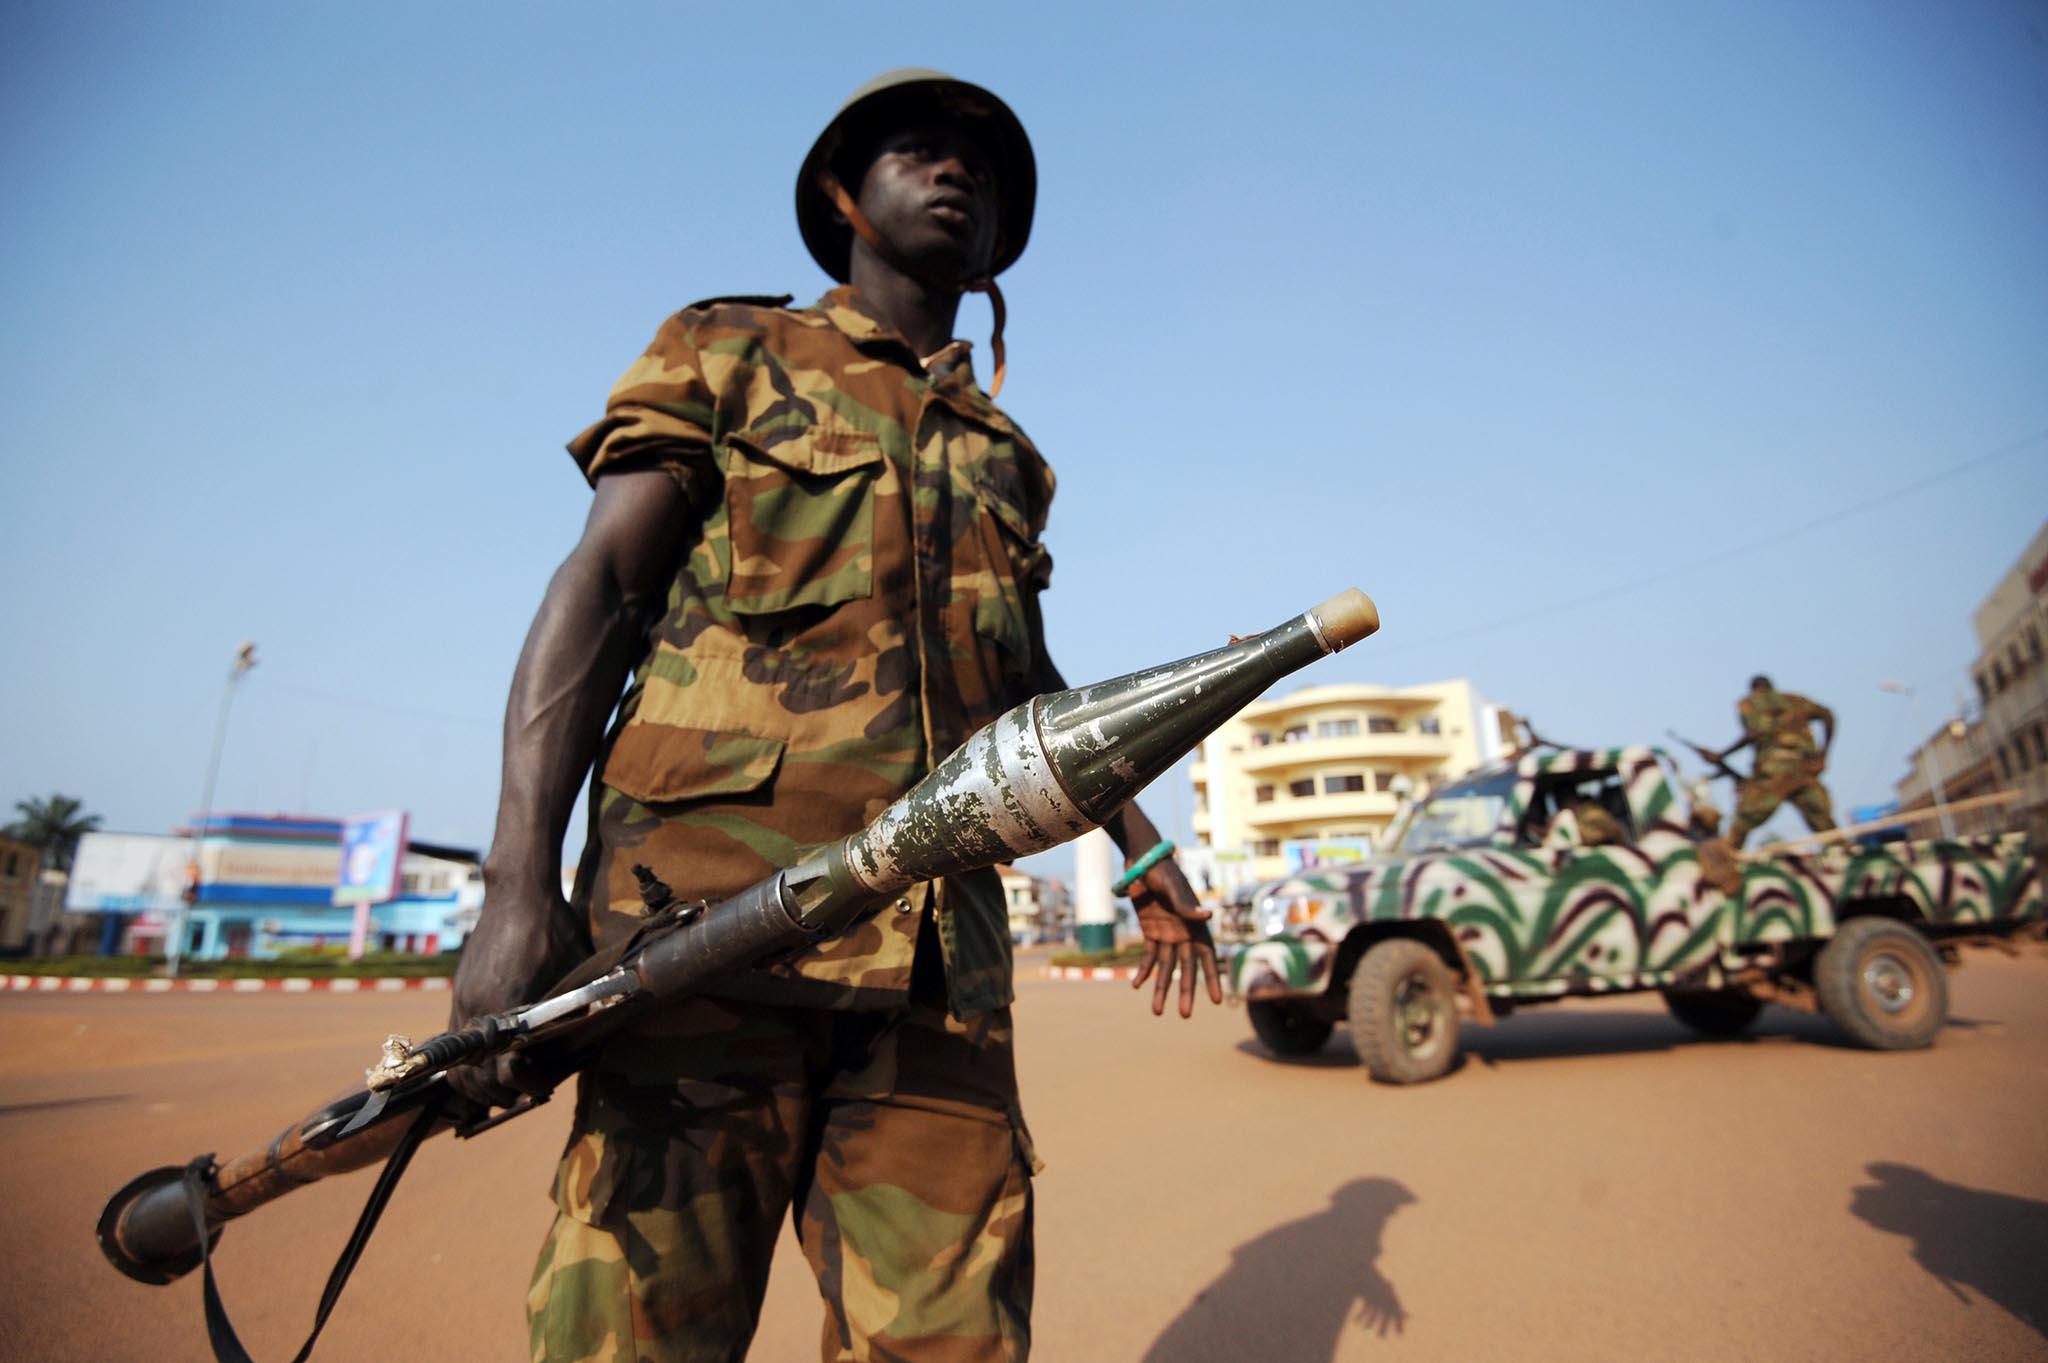 Soldiers patrol on December 5, 2013 in a street of Bangui